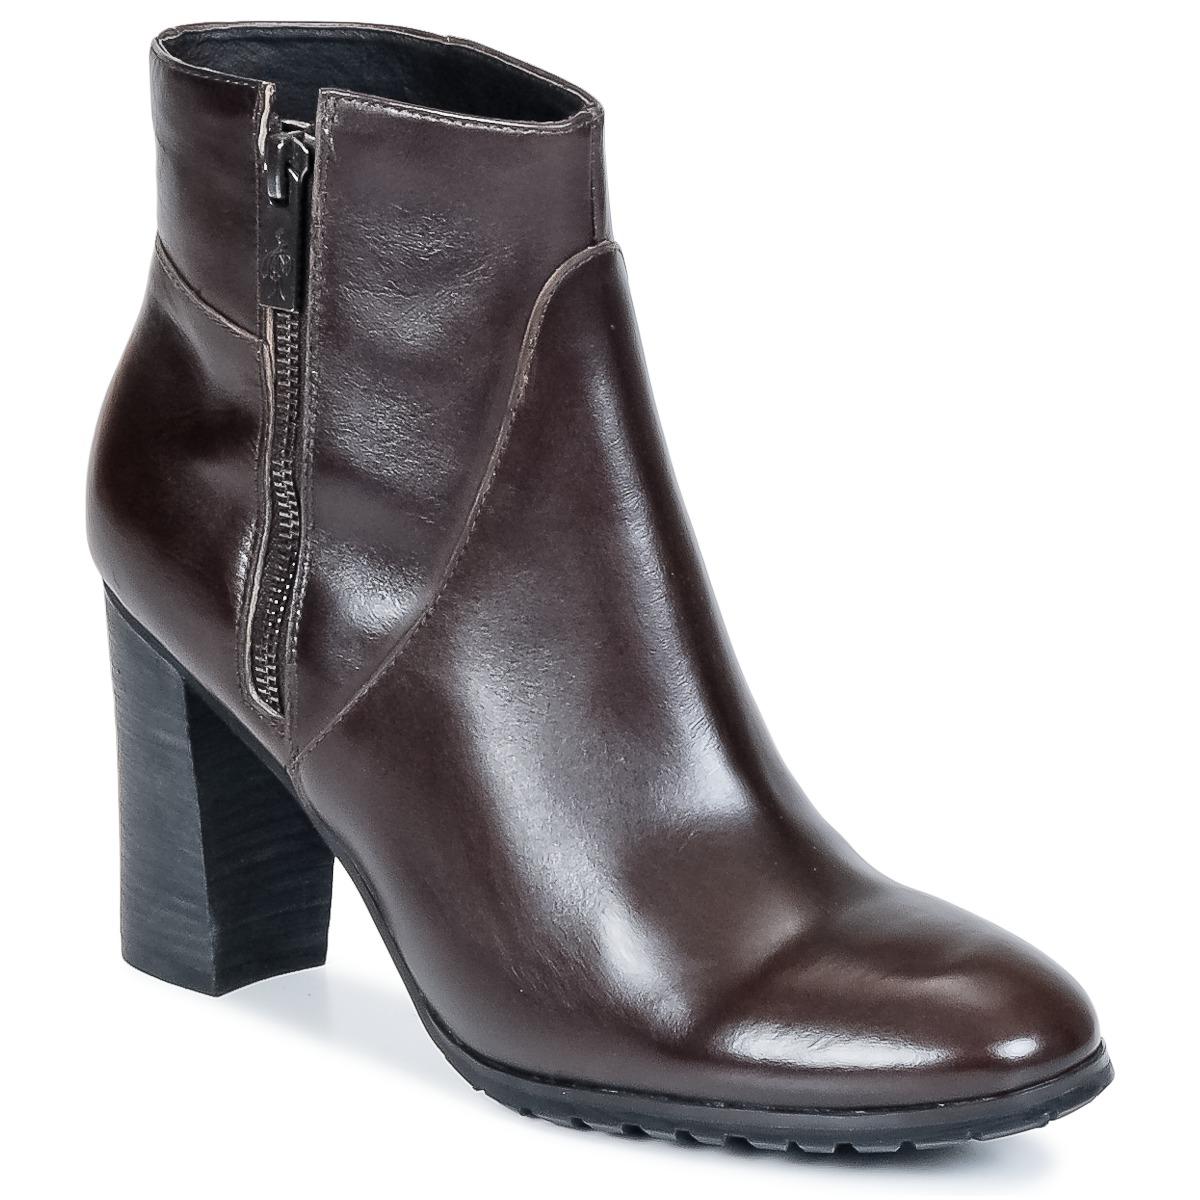 One Step ISIAH Schokobraun - Kostenloser Versand bei Spartoode ! - Schuhe Low Boots Damen 80,00 €